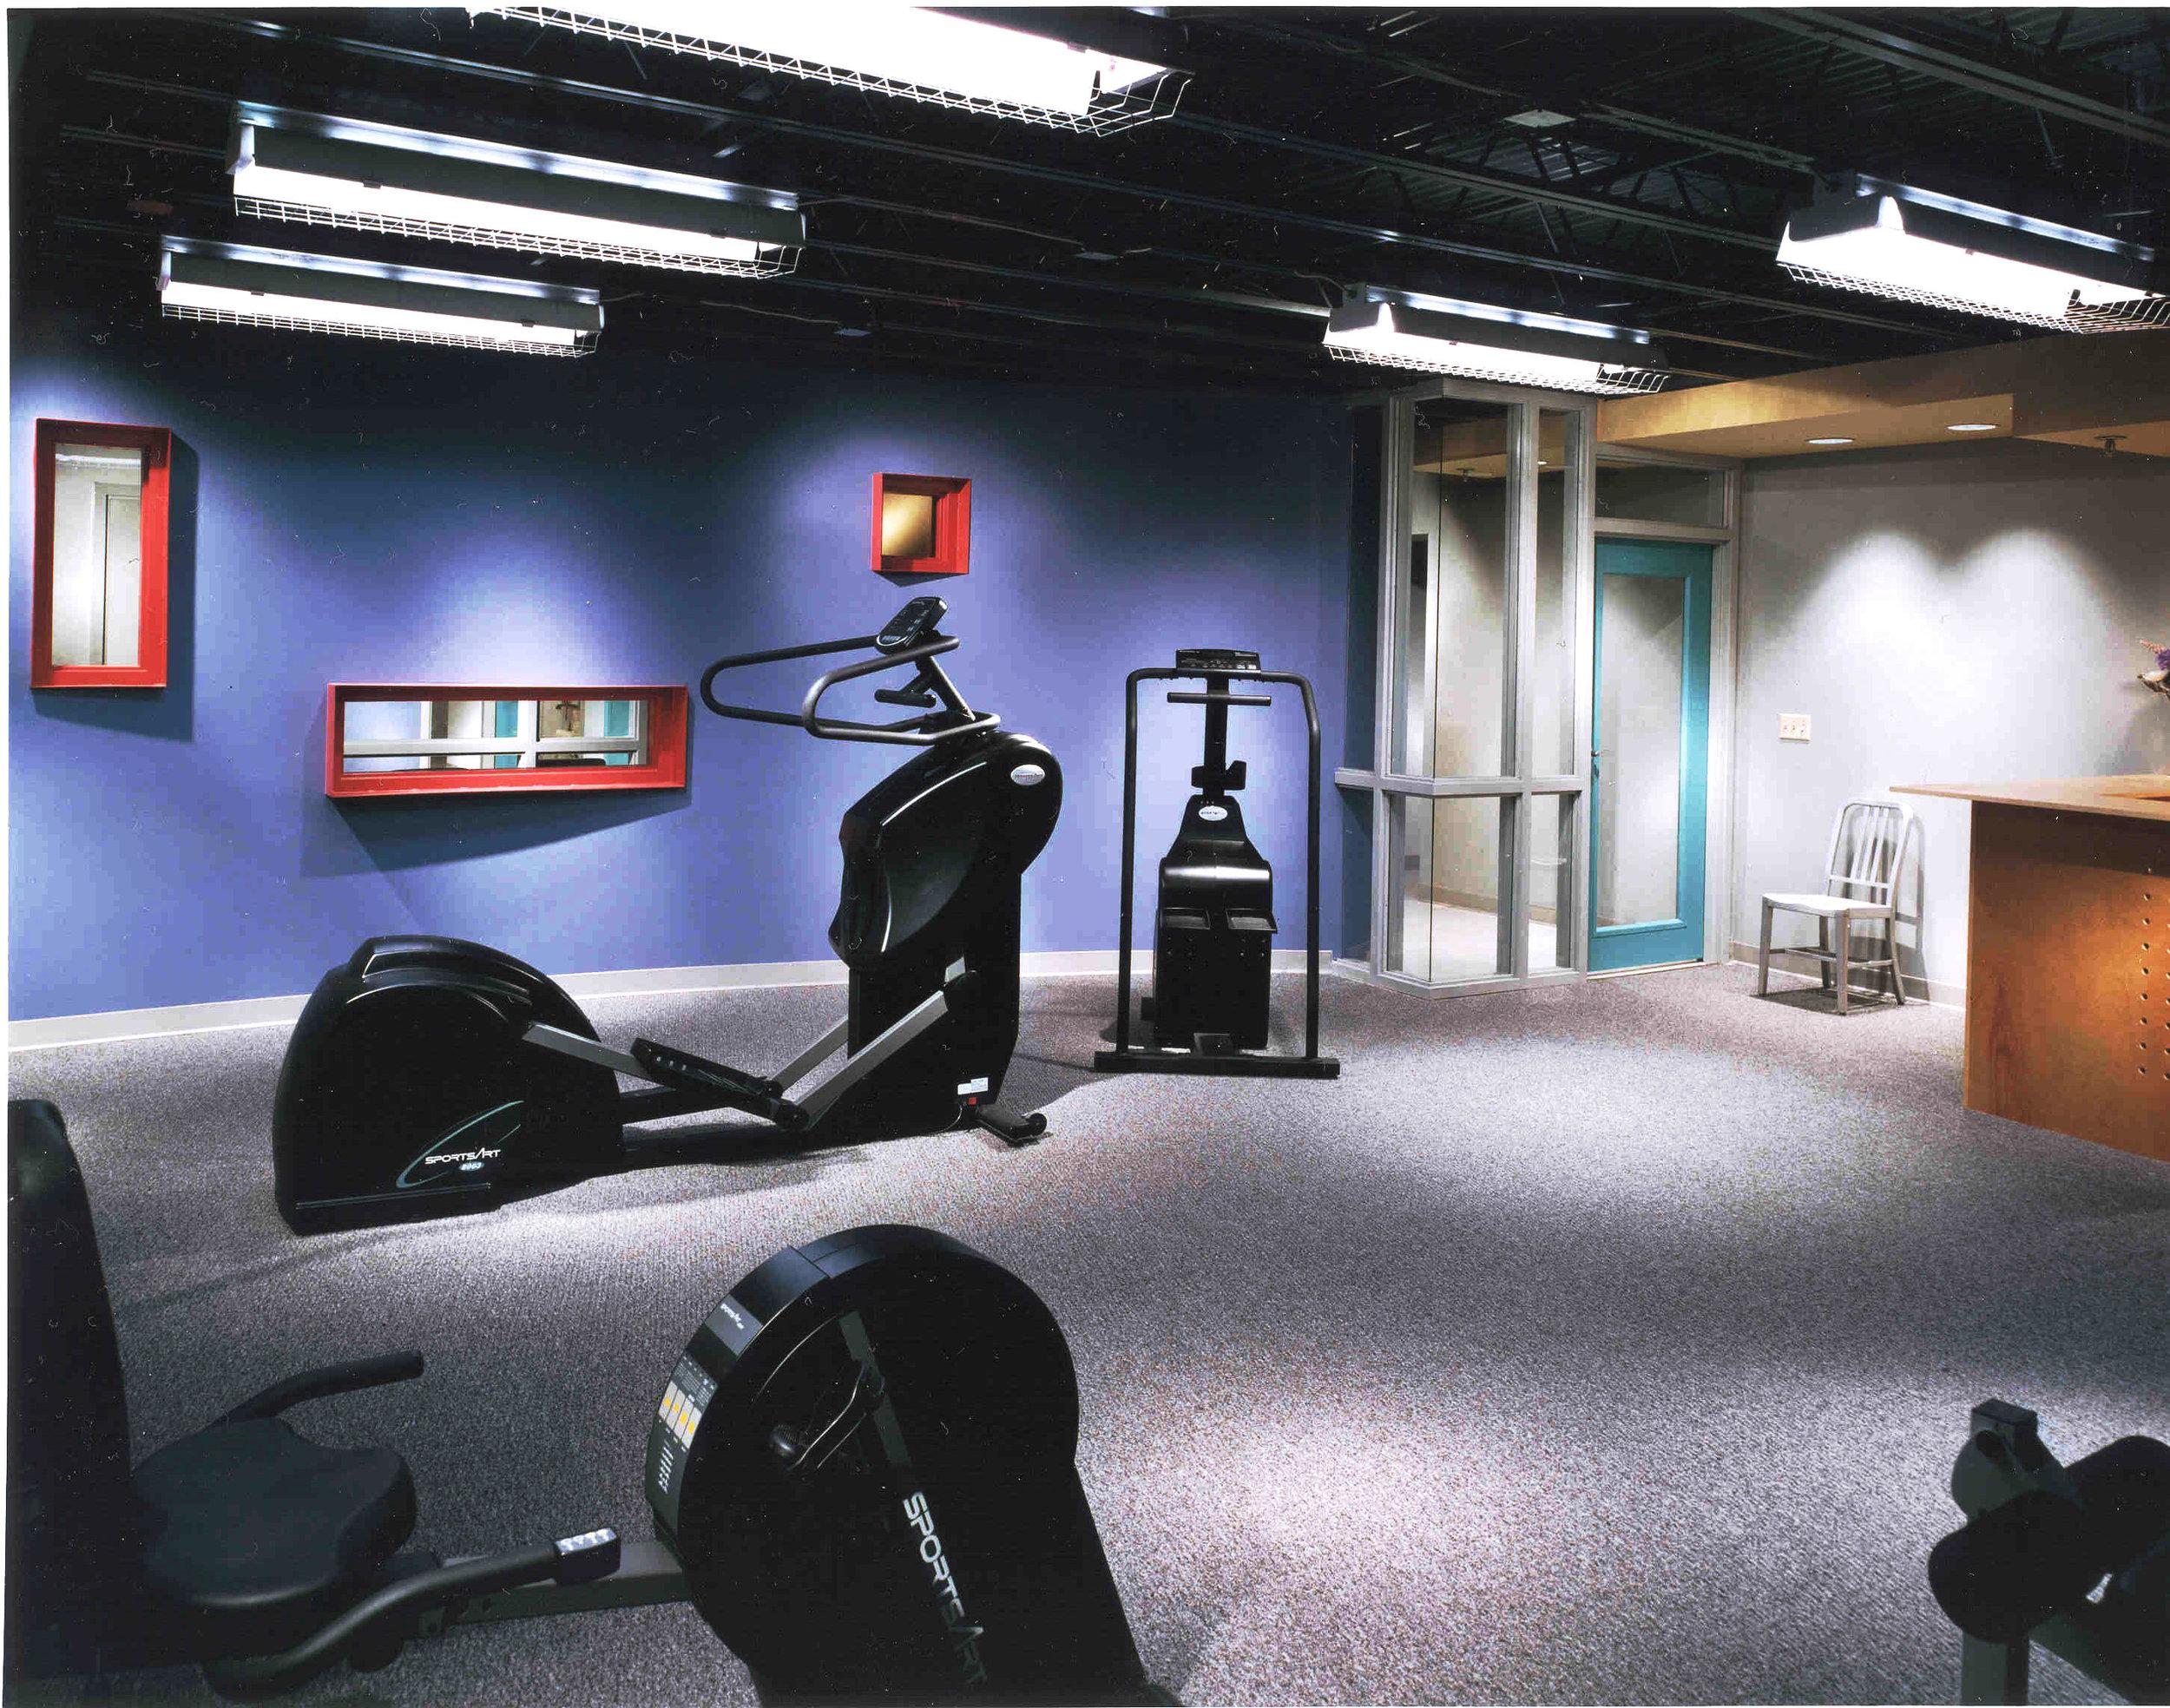 Copy of exerciseroom.jpg